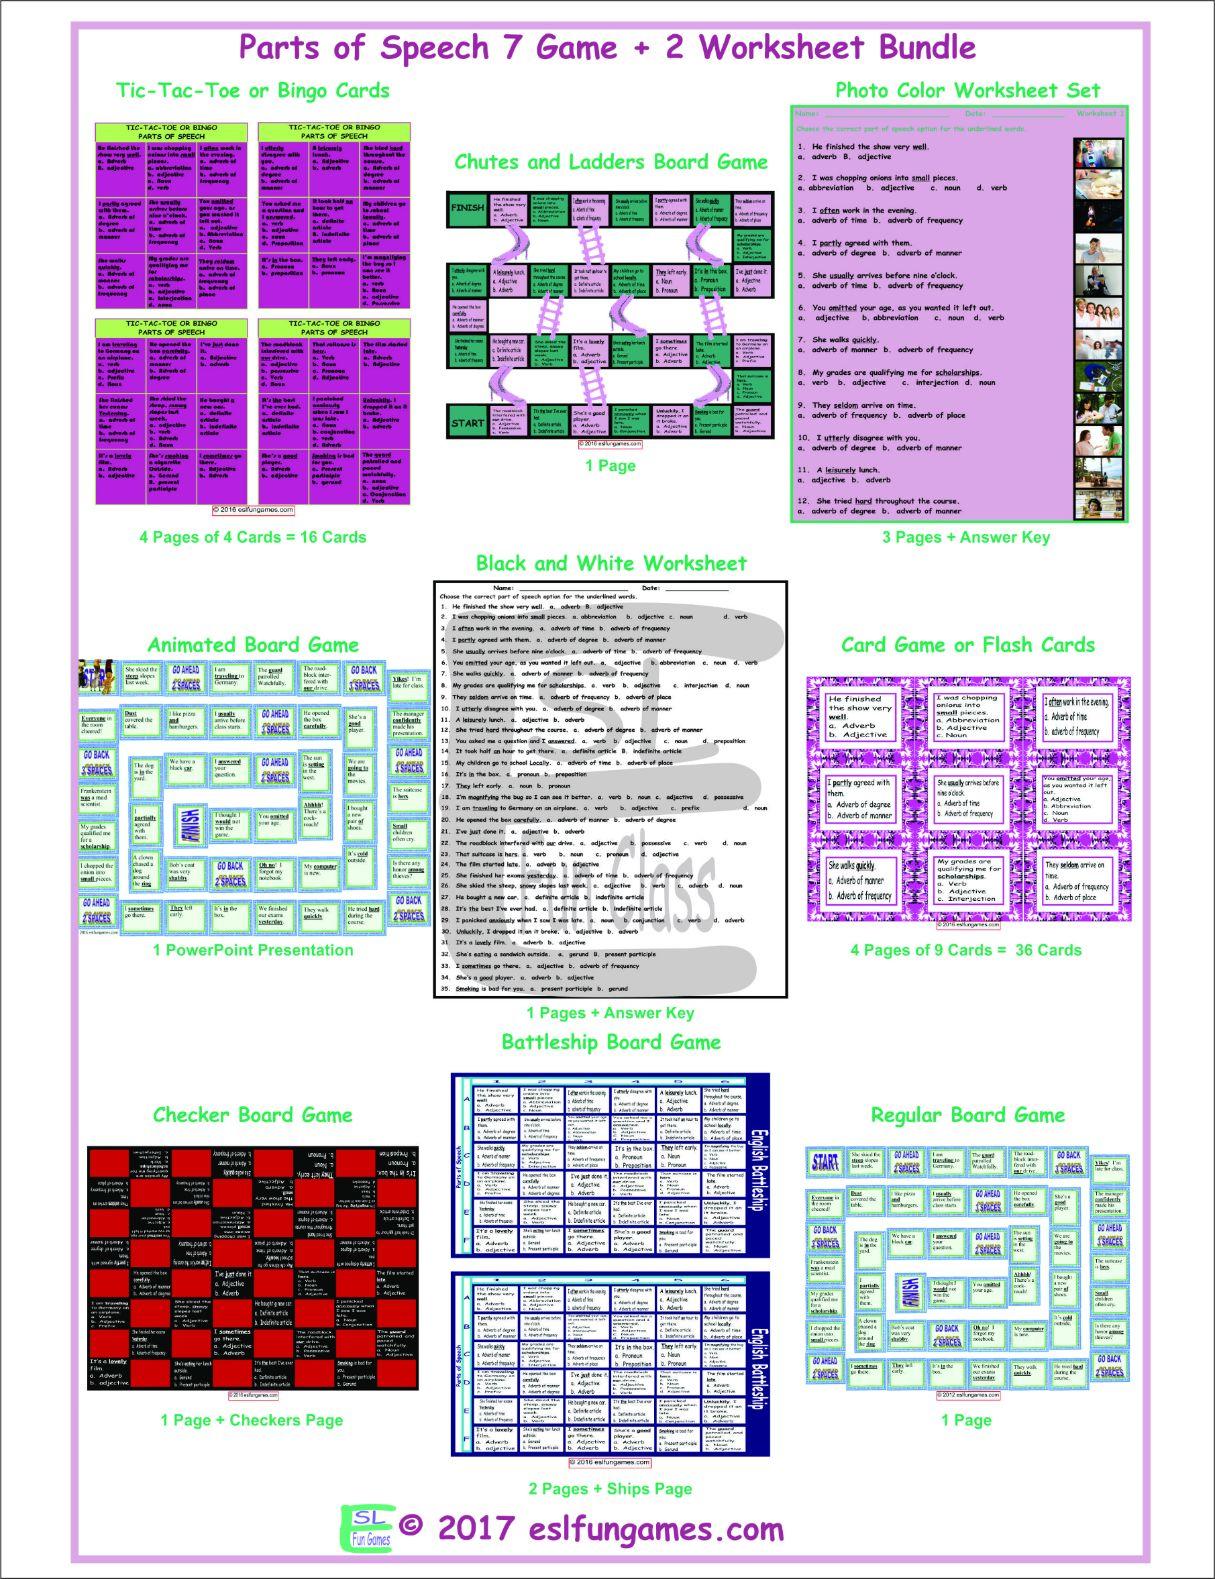 Parts Of Speech 7 Game Plus 2 Worksheet Bundle By